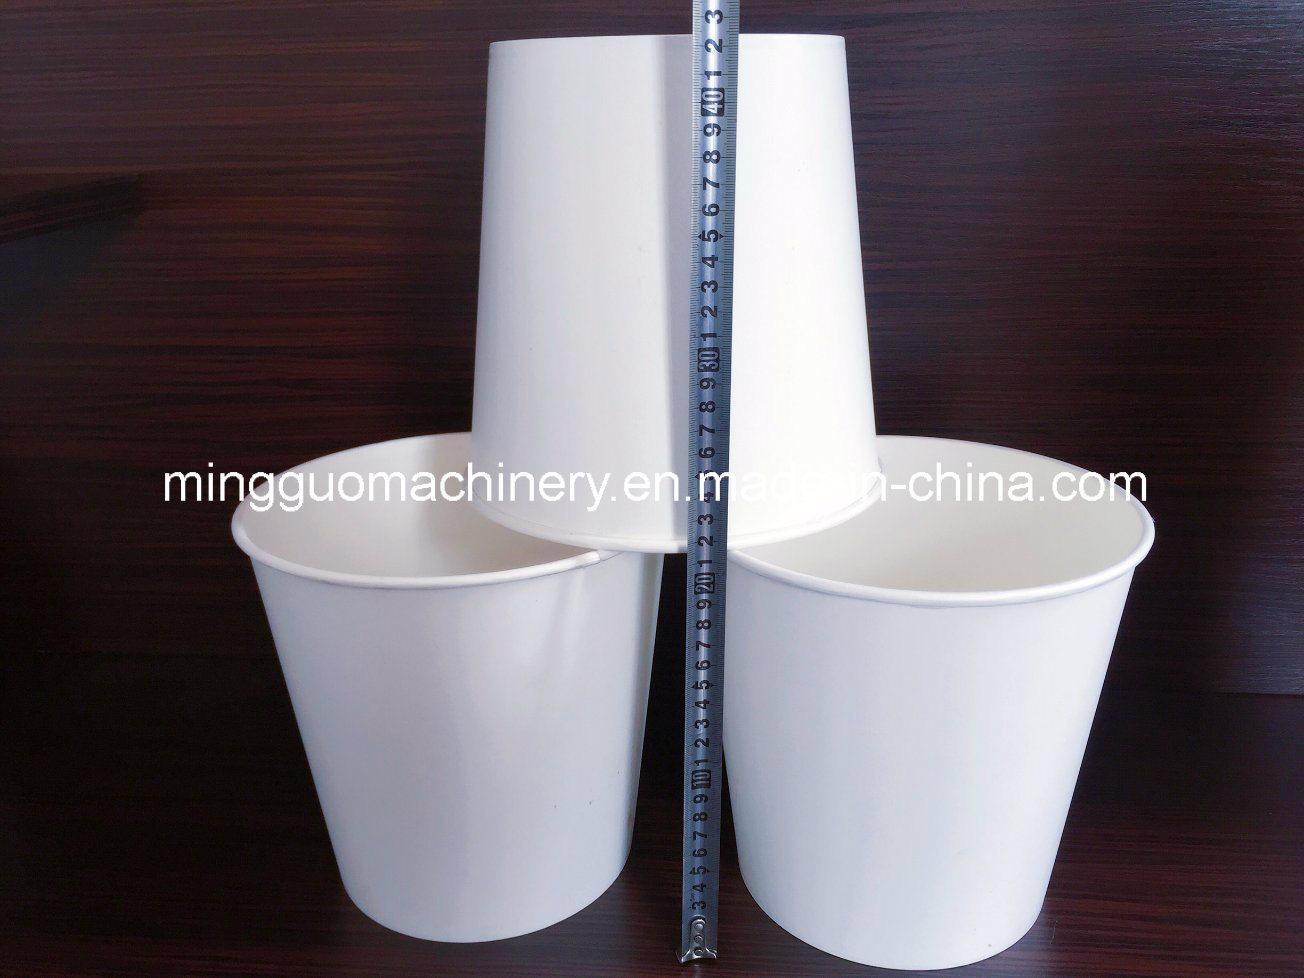 Paper Bucket Fired Chicken Paper Cup Making Machine